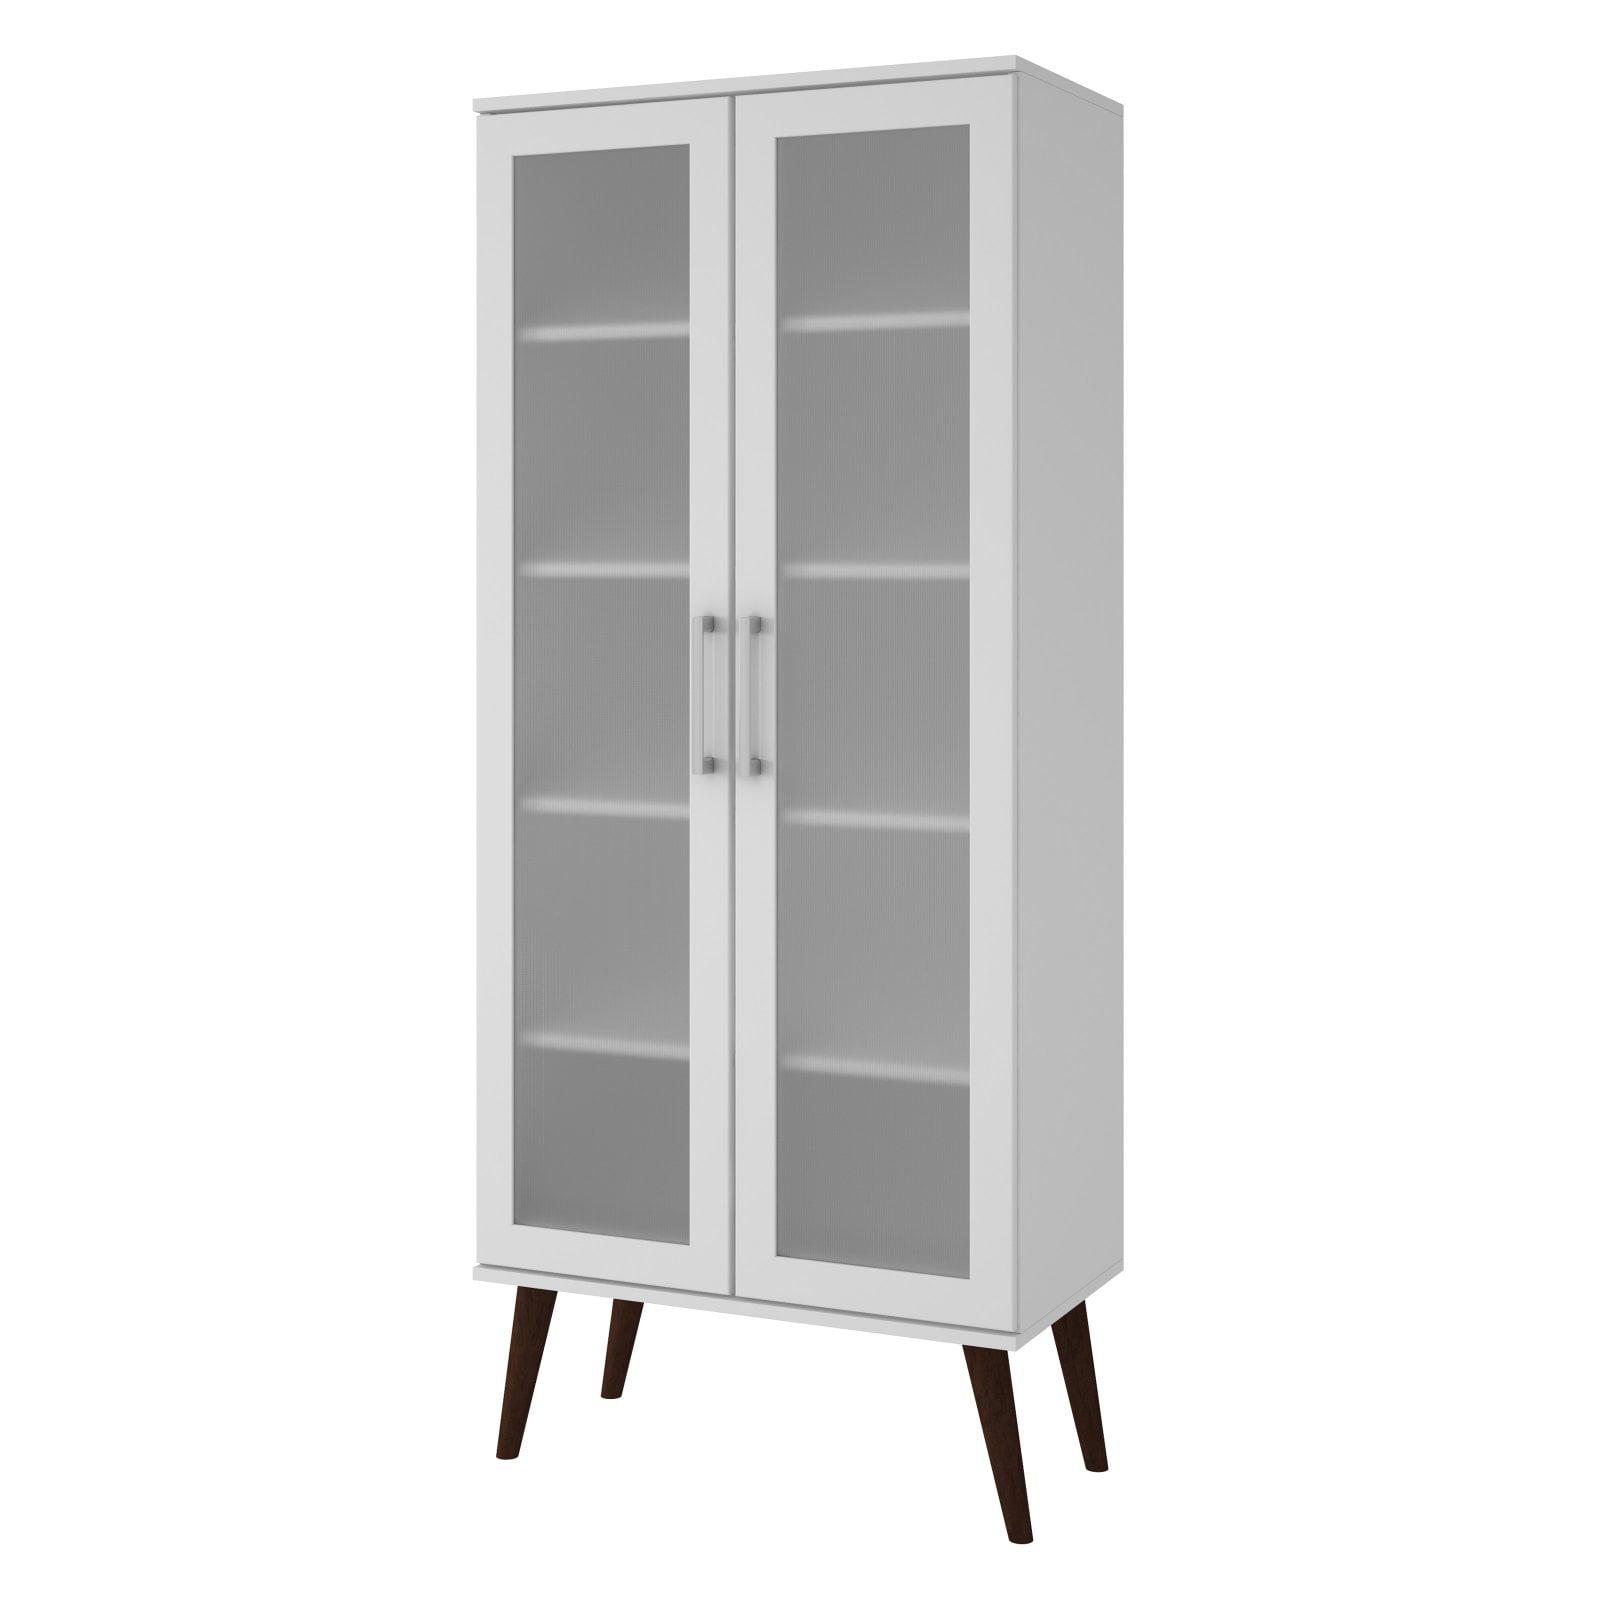 Manhattan Comfort Serra 2 0 Barrister Bookcase With Splayed Wooden Legs Walmart Com